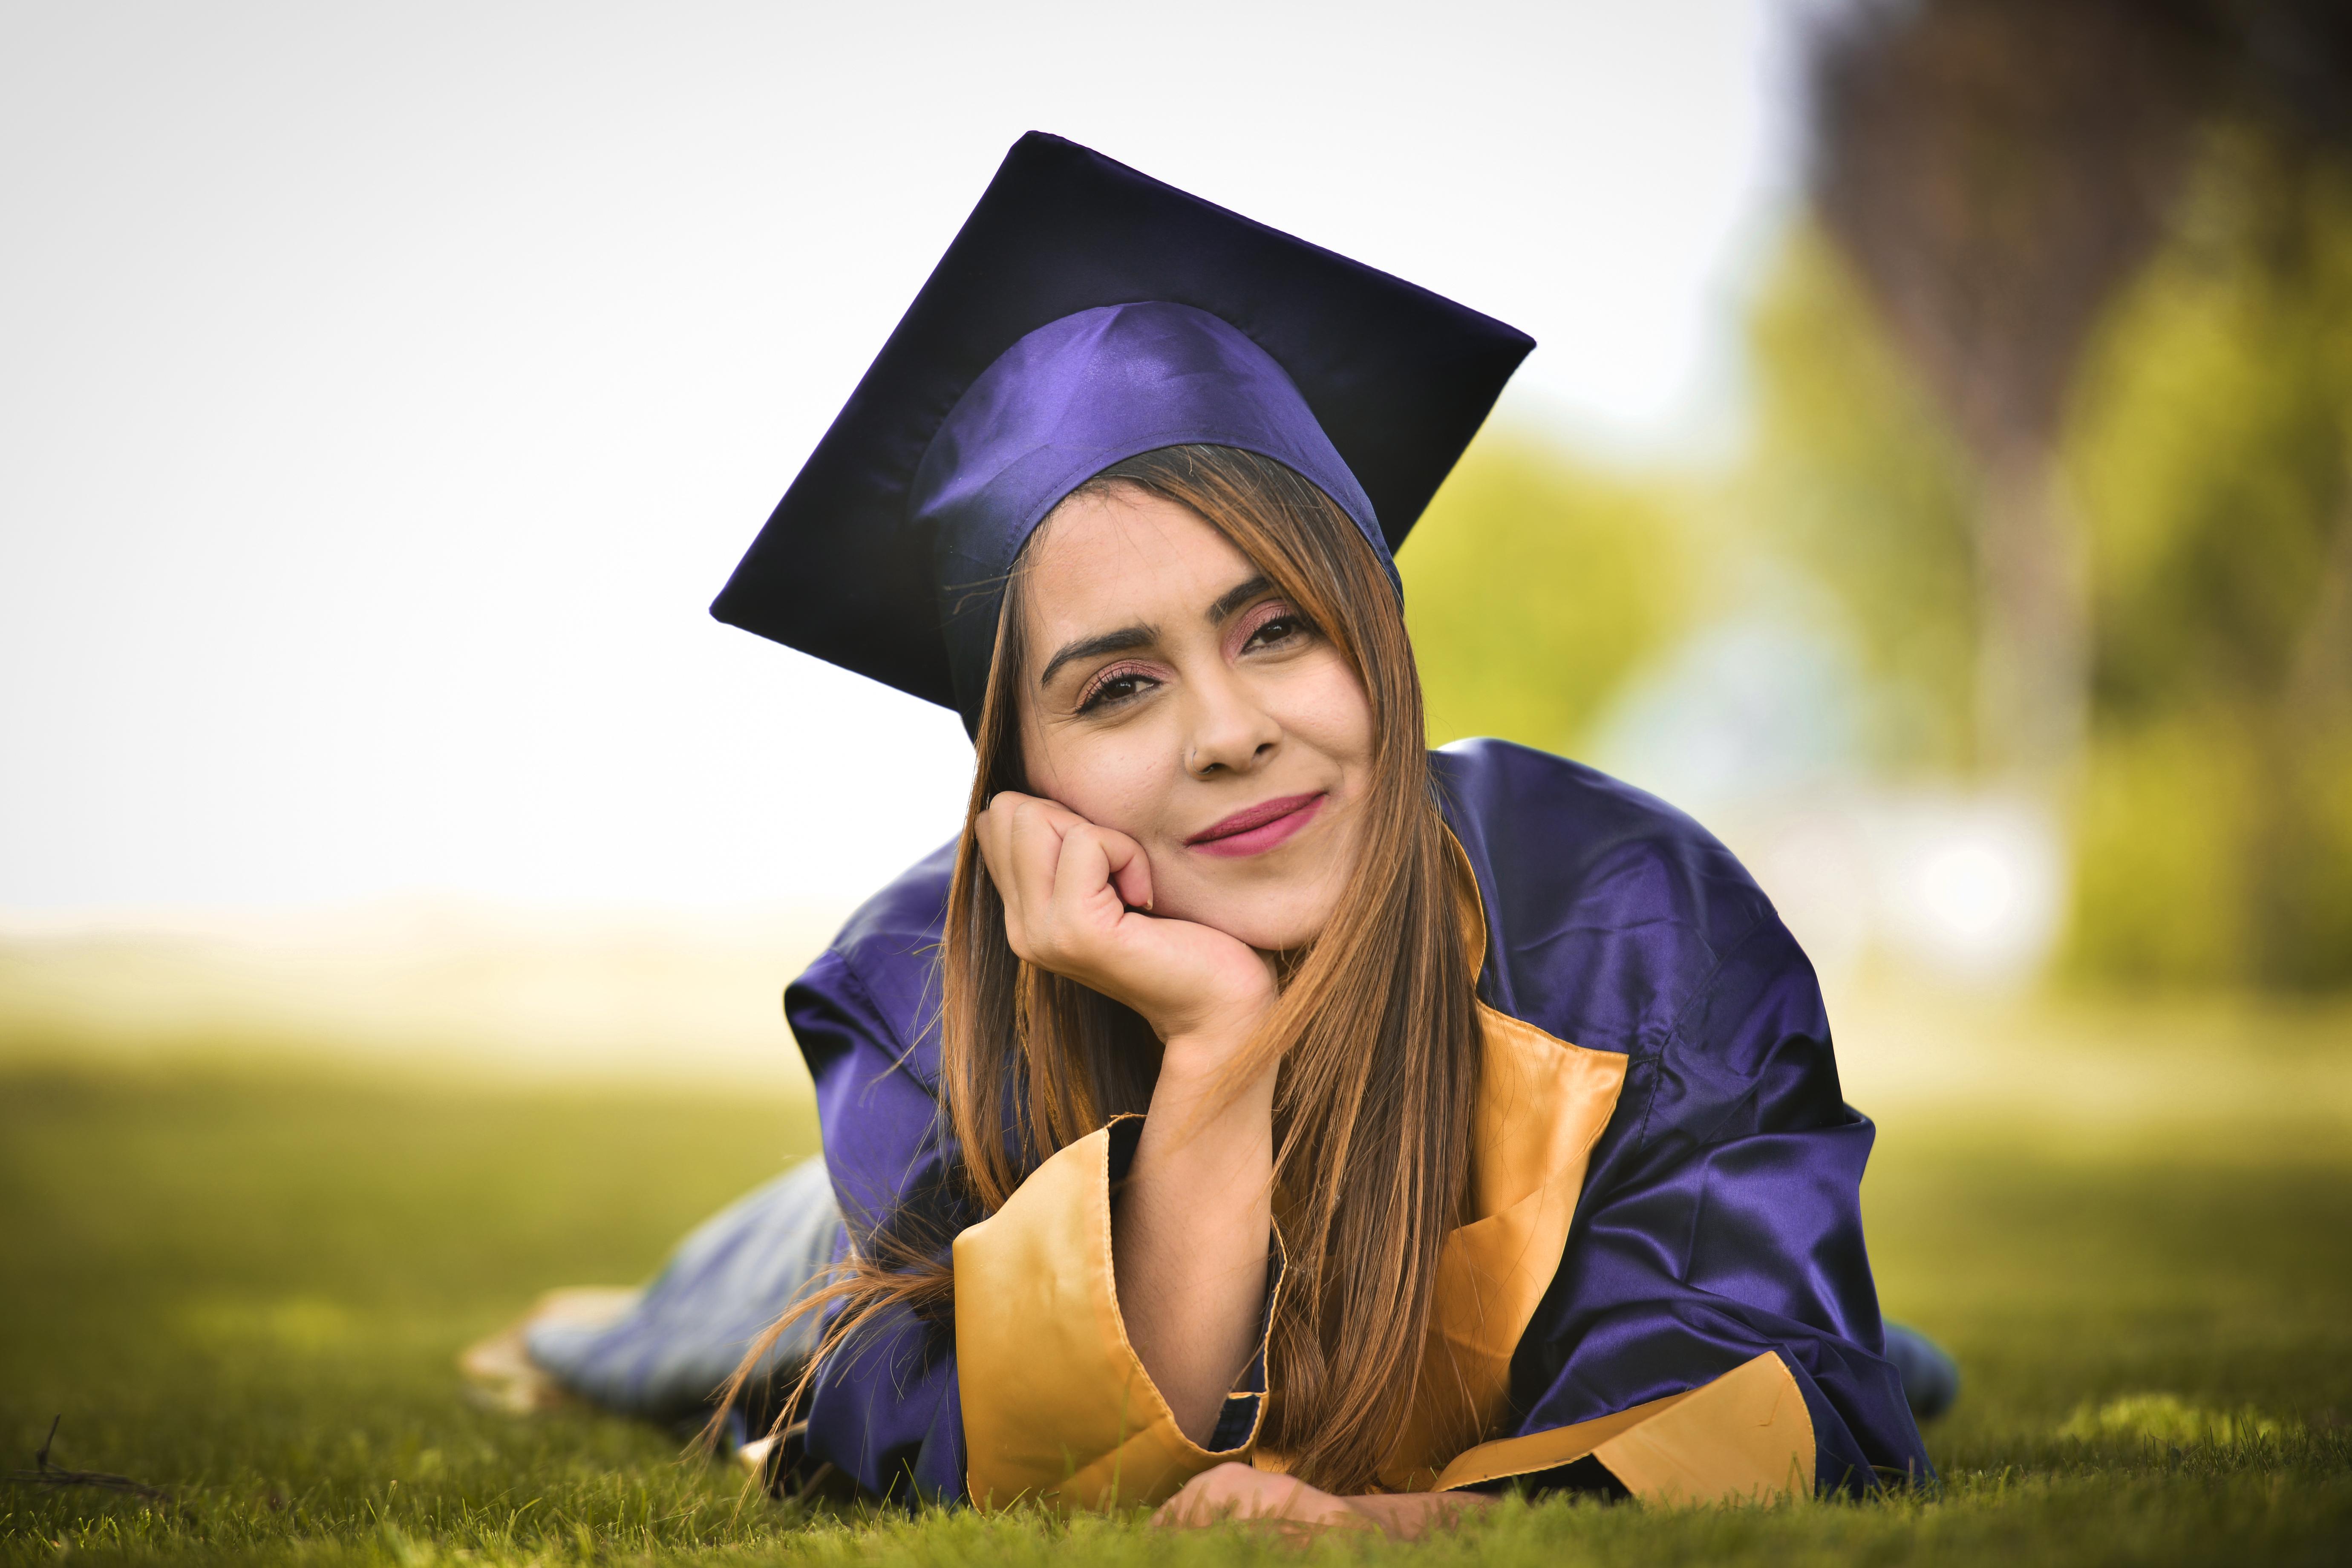 Graduate lying on grass